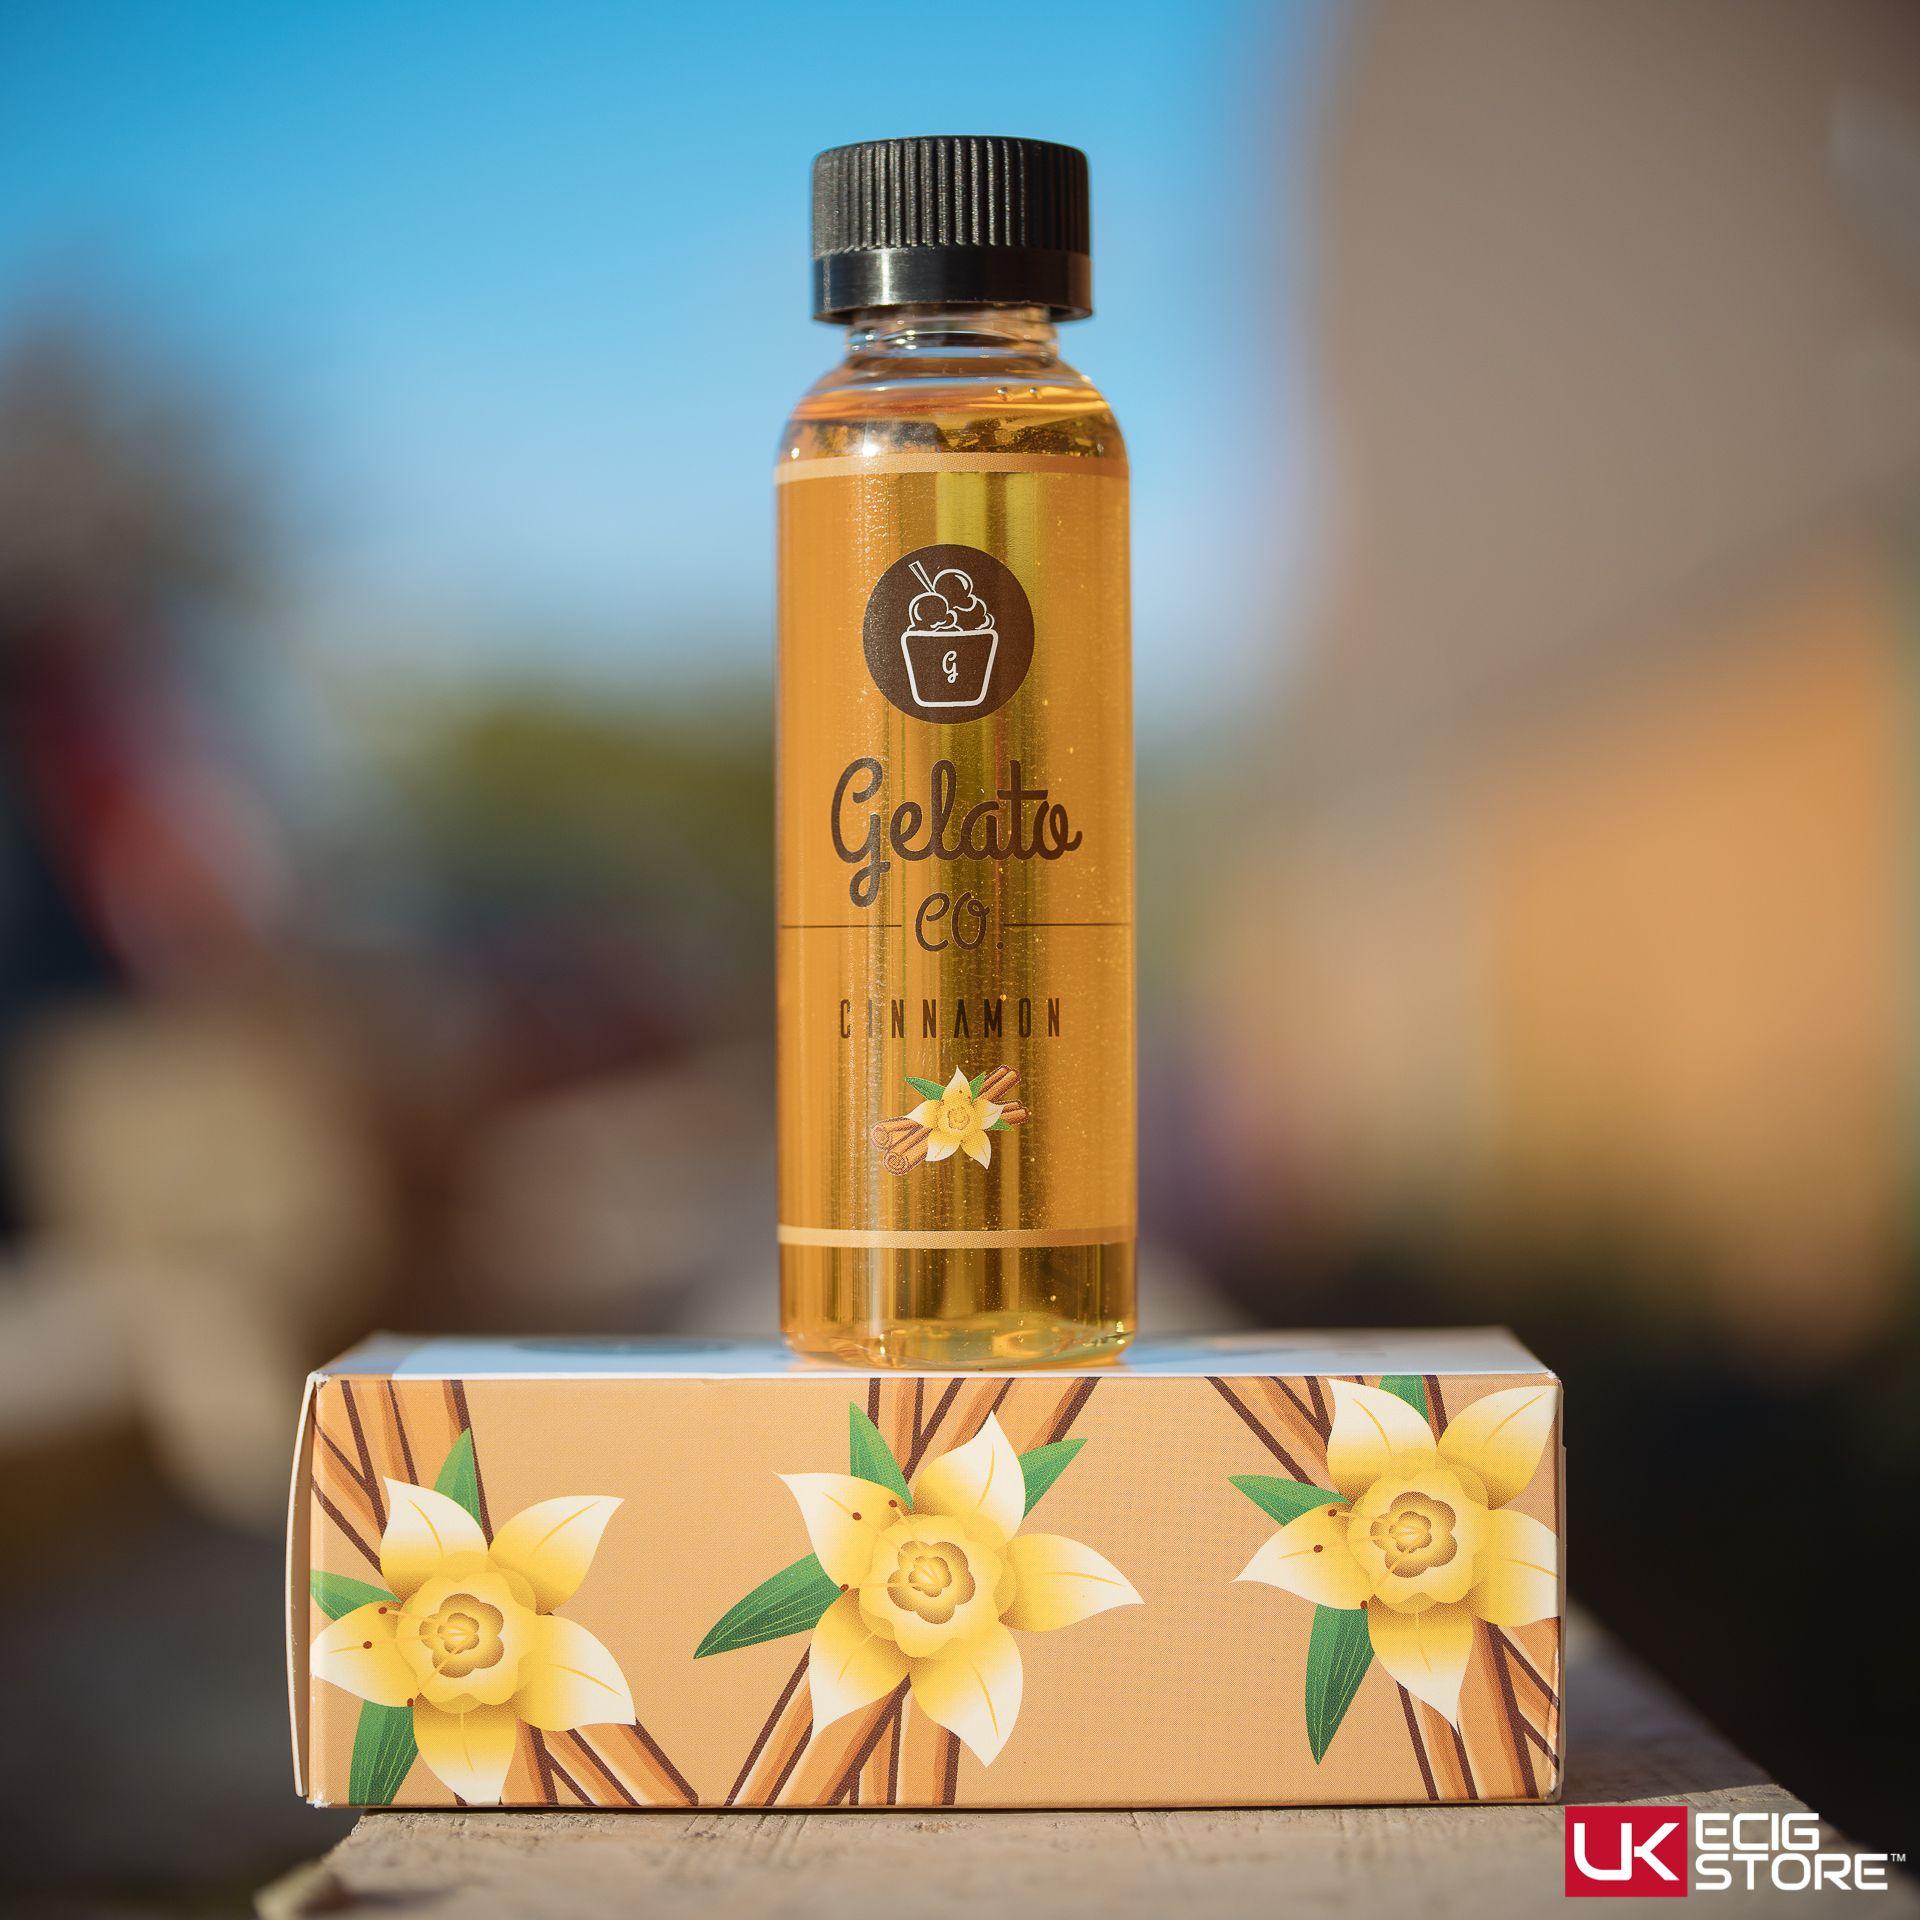 Gelato Co Cinnamon  Prominent Flavours: Cinnamon, Gelato  #Cinnamon #Gelato #ELiquid  Available in-store & online https://www.ukecigstore.com/gelato-co-cinnamon.html